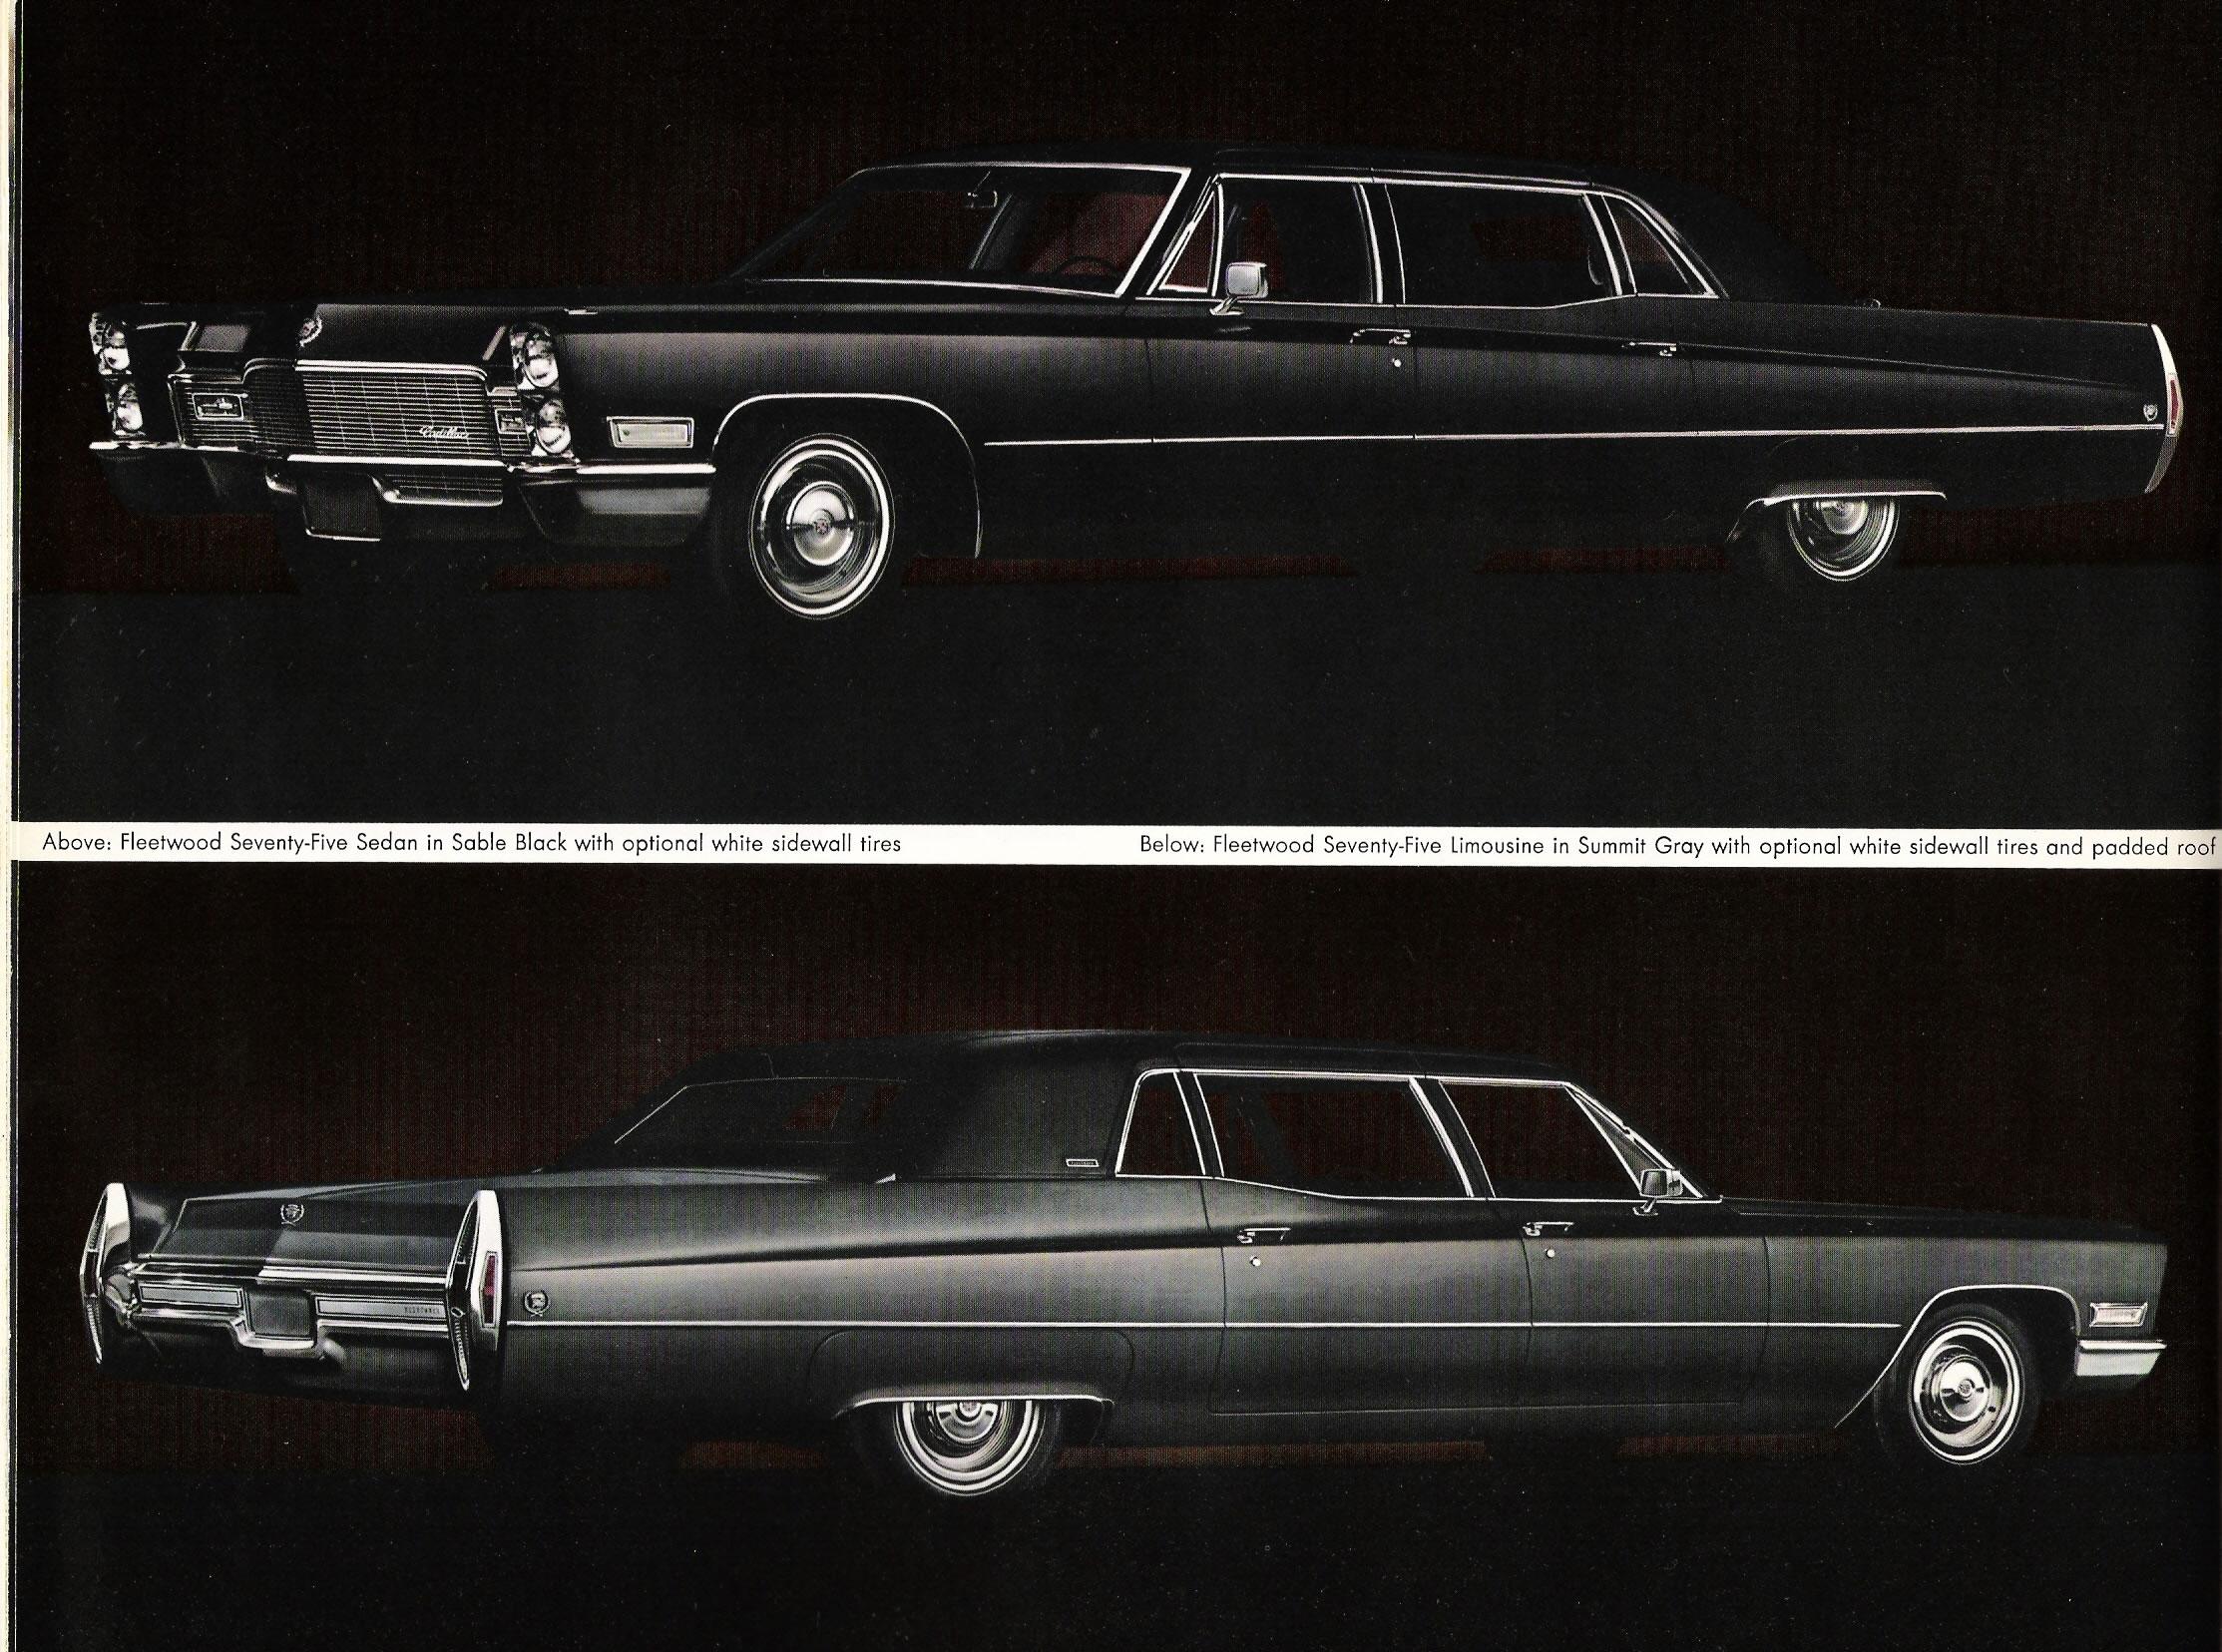 Car Brochures 1968 Cadillac Brochure 1968 Cadillac 03 Jpg